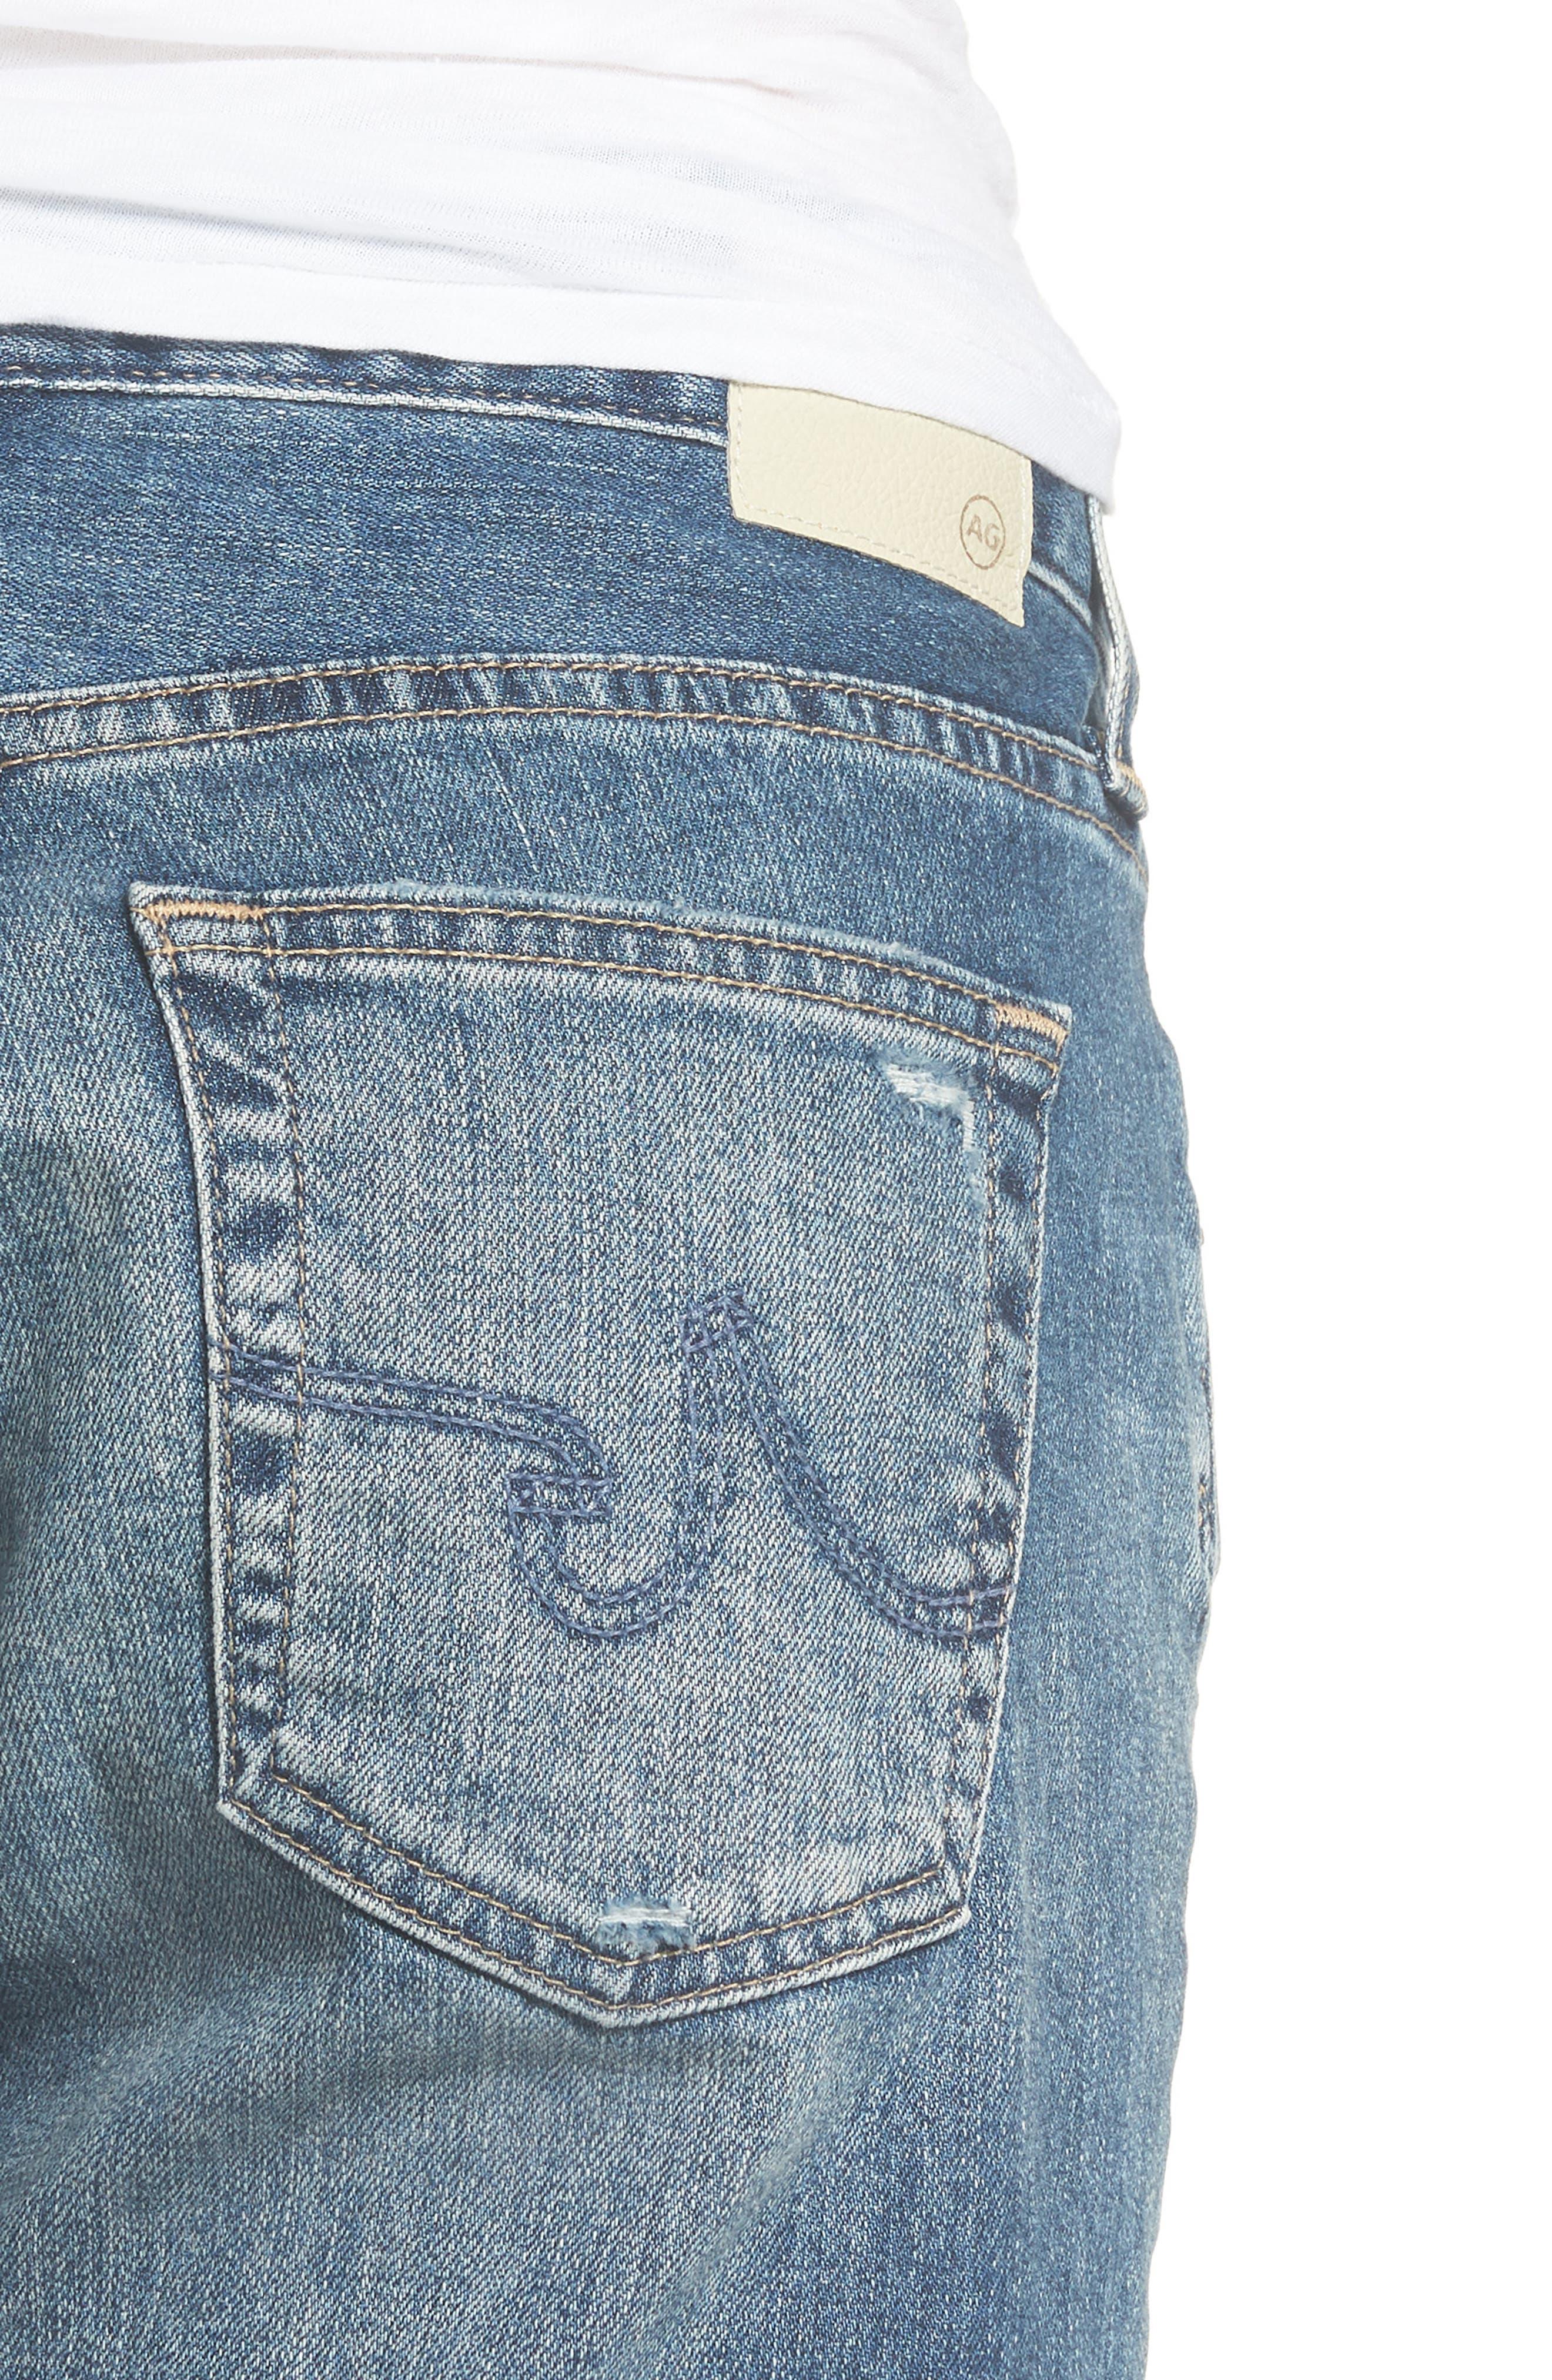 Nikki Cutoff Denim Shorts,                             Alternate thumbnail 4, color,                             20Y BRILLANCE